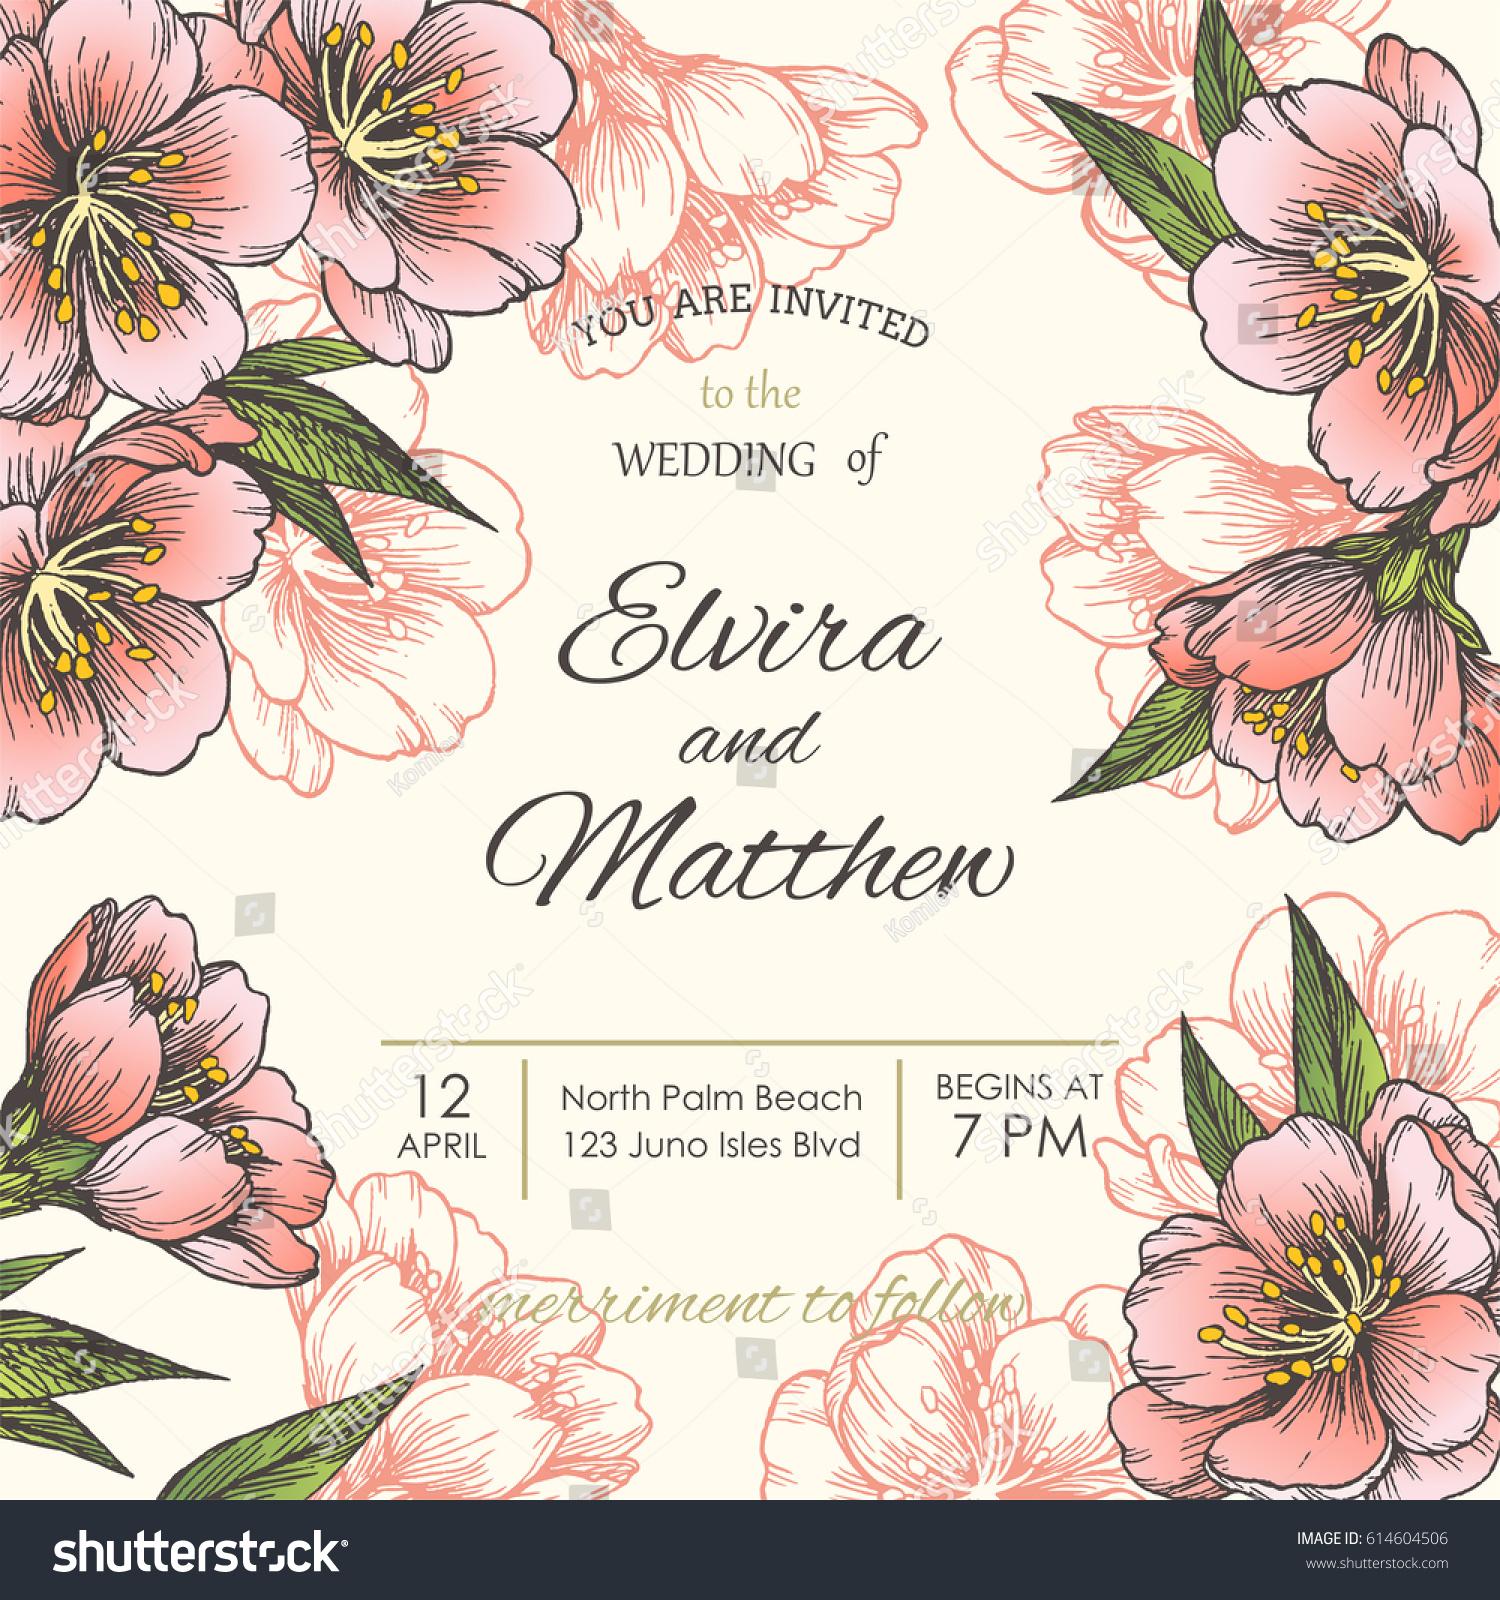 Vintage Wedding Invitation Or Greeting Card Template Vector Hand Drawn Illustration With Spring Blooming Sakura